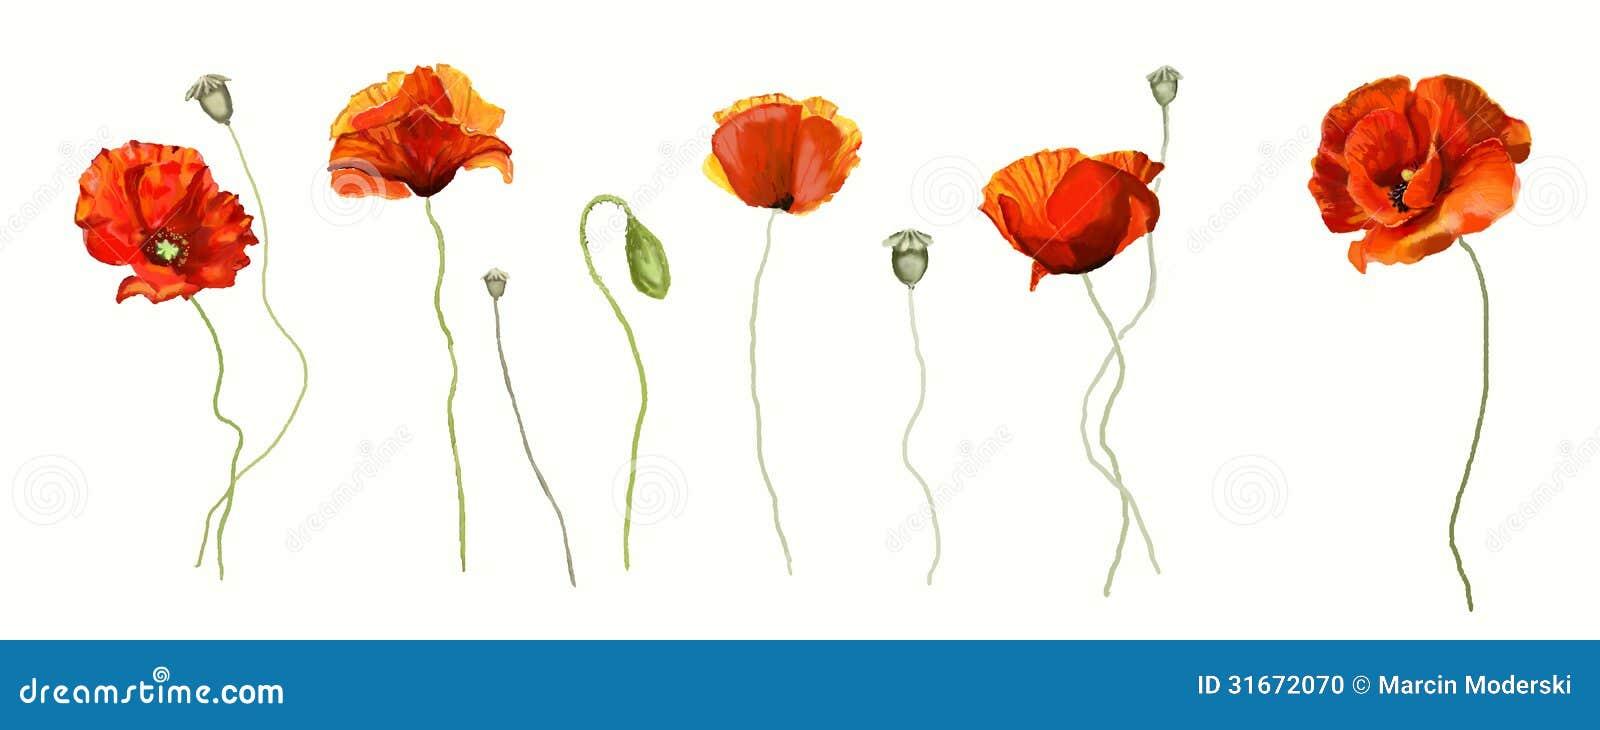 Poppy Flower Stock Illustration Illustration Of Sketch 31672070